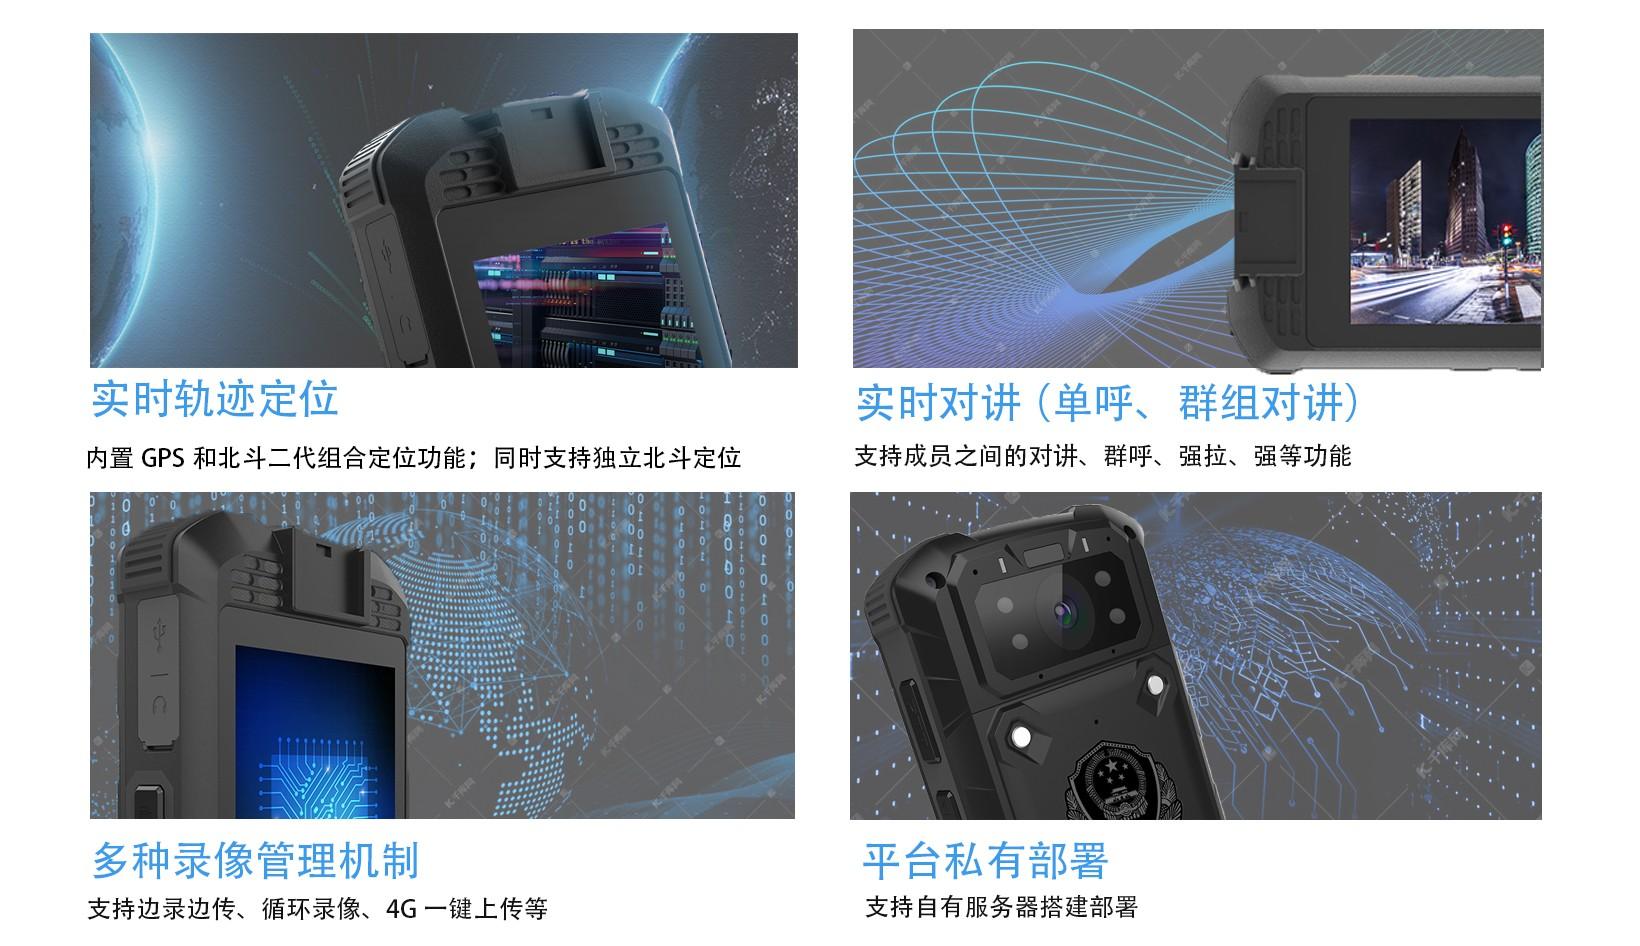 4G执法记录仪功能.jpg